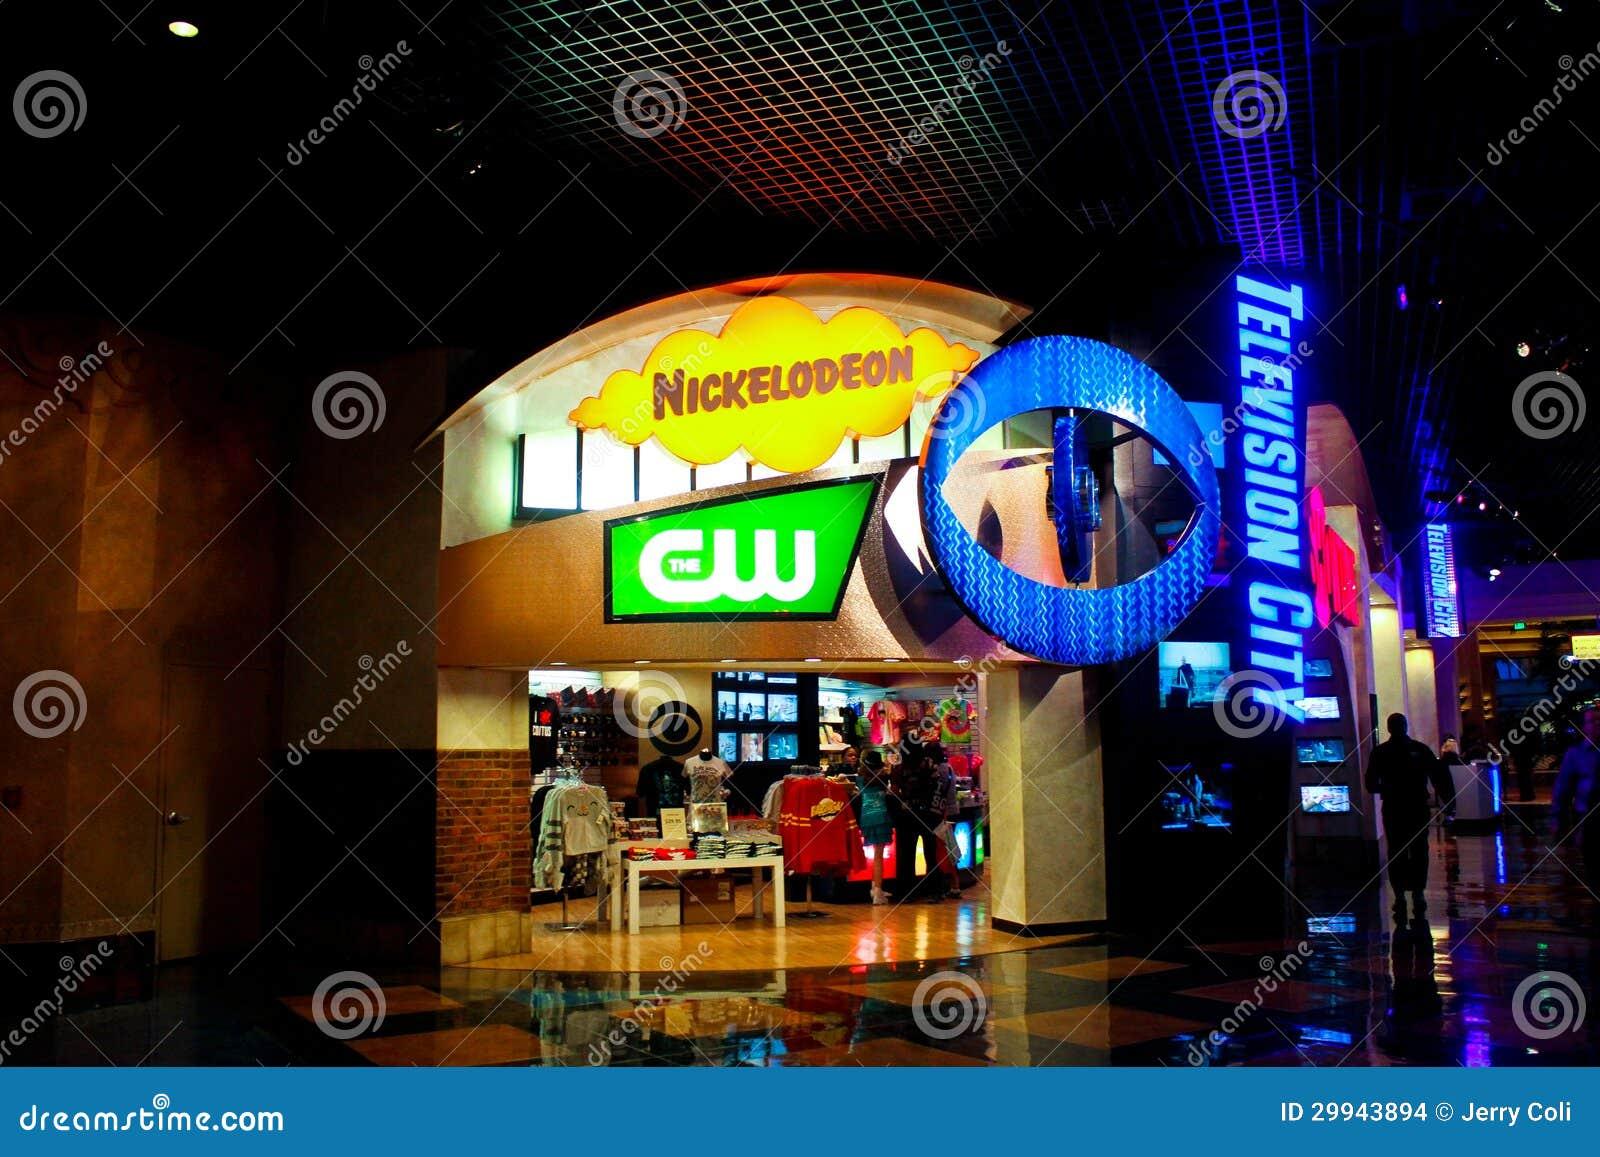 MGM Grand Hotel  The Strip  Las Vegas NV  Yelp